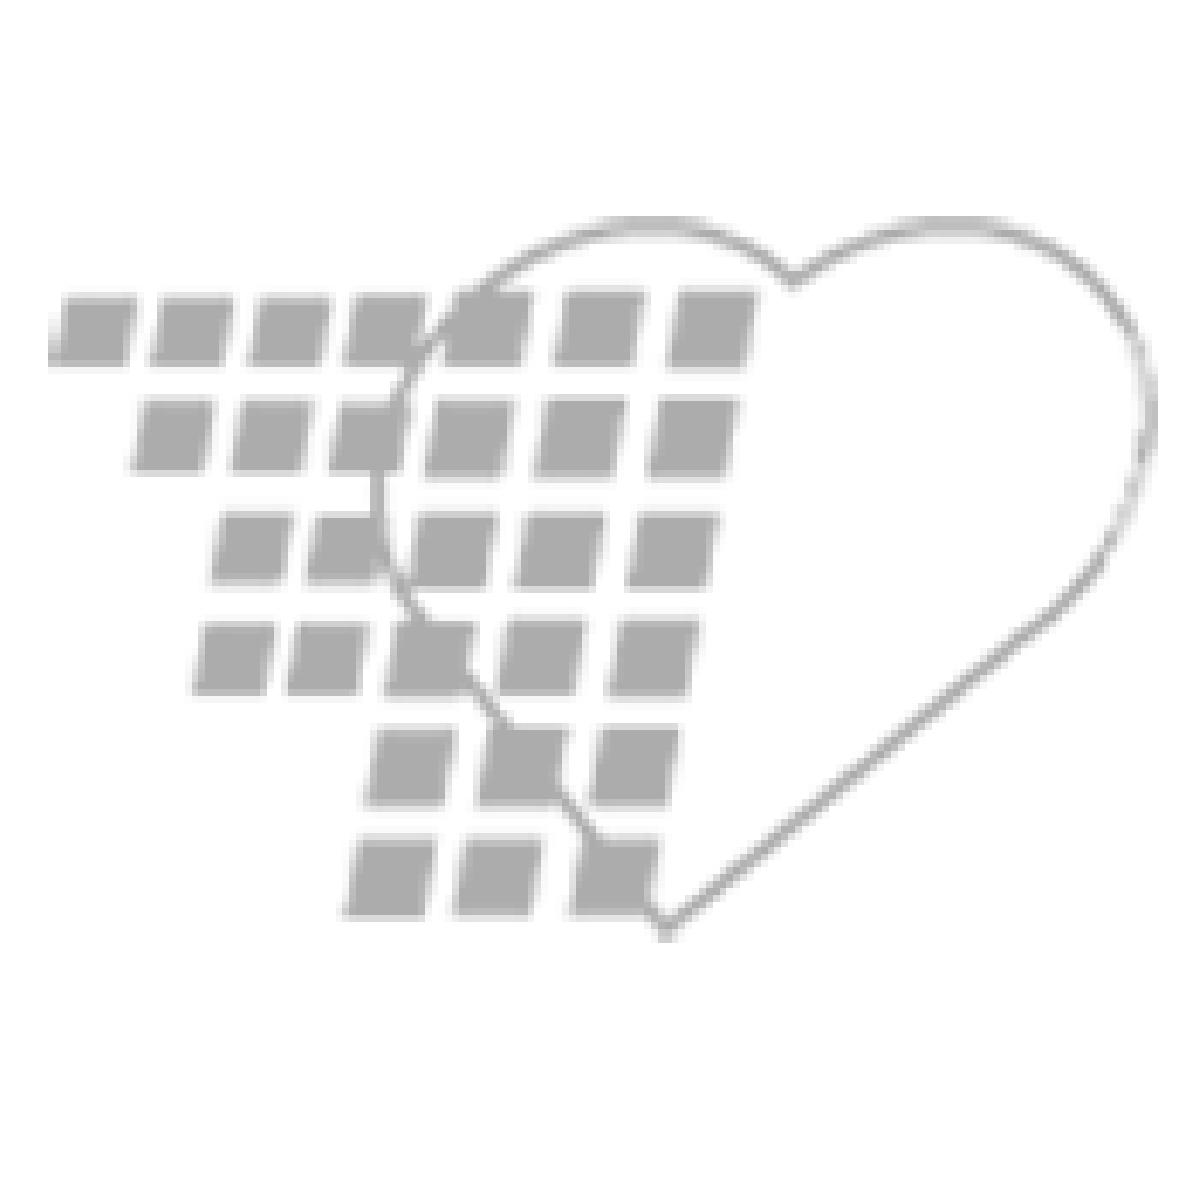 06-62-2025 Pocket Nurse® Glass Mortar and Pestle